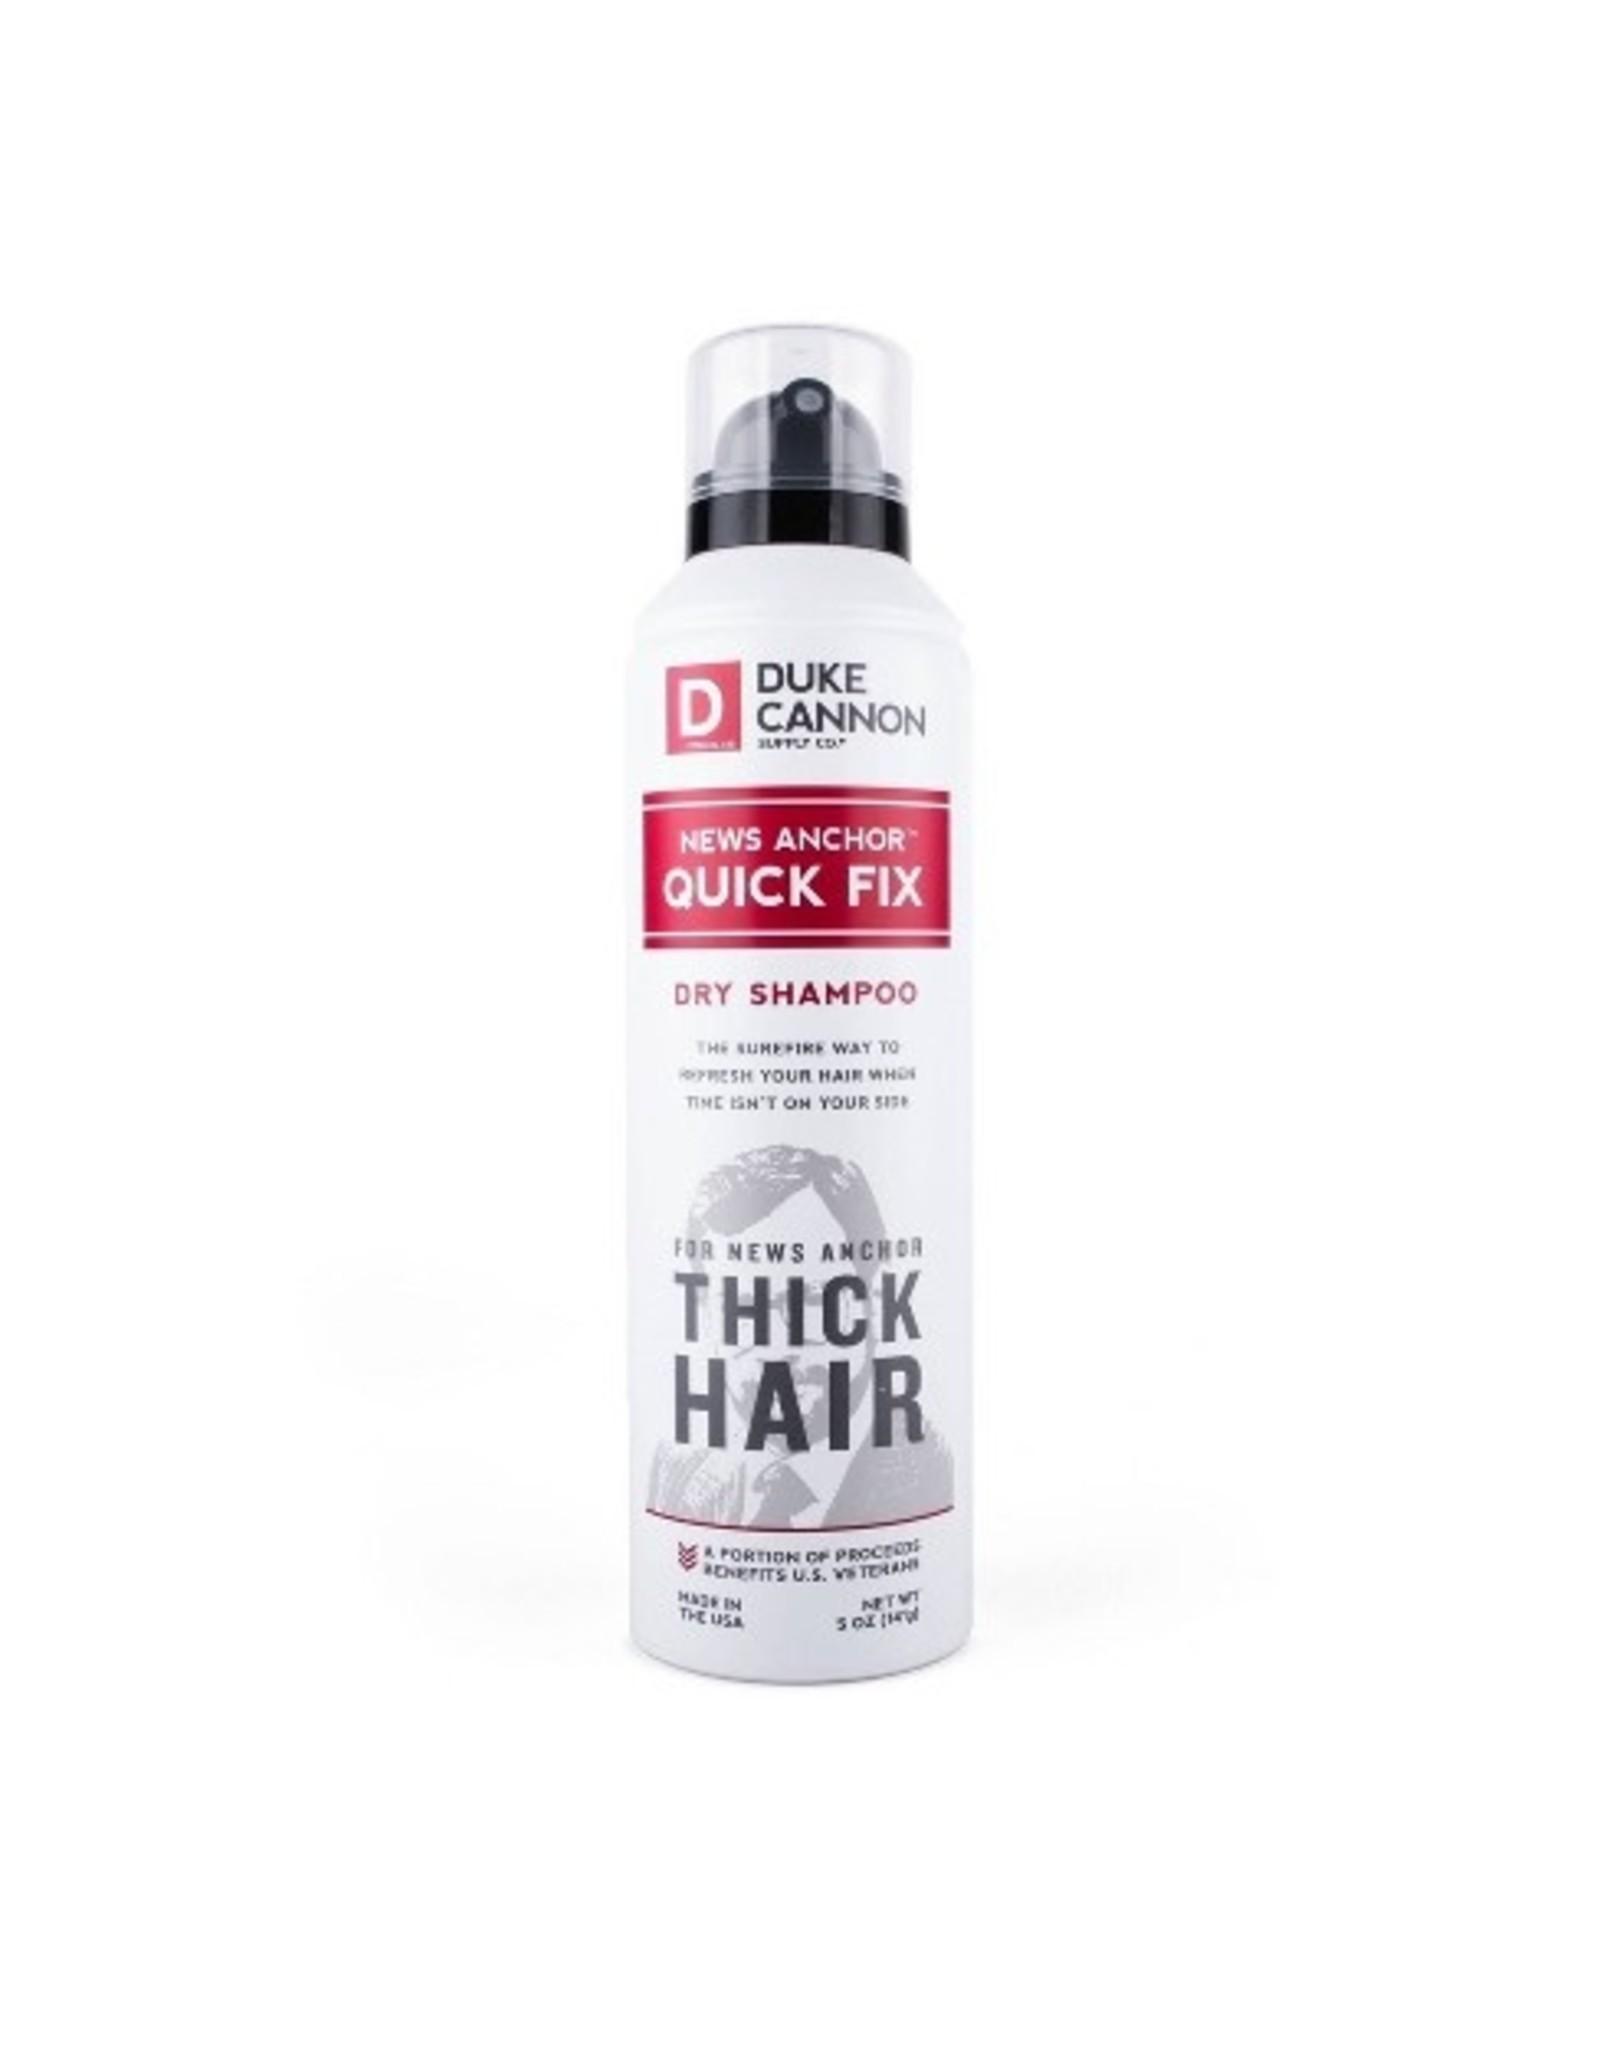 Duke Cannon News Anchor Quick Fix Dry Shampoo